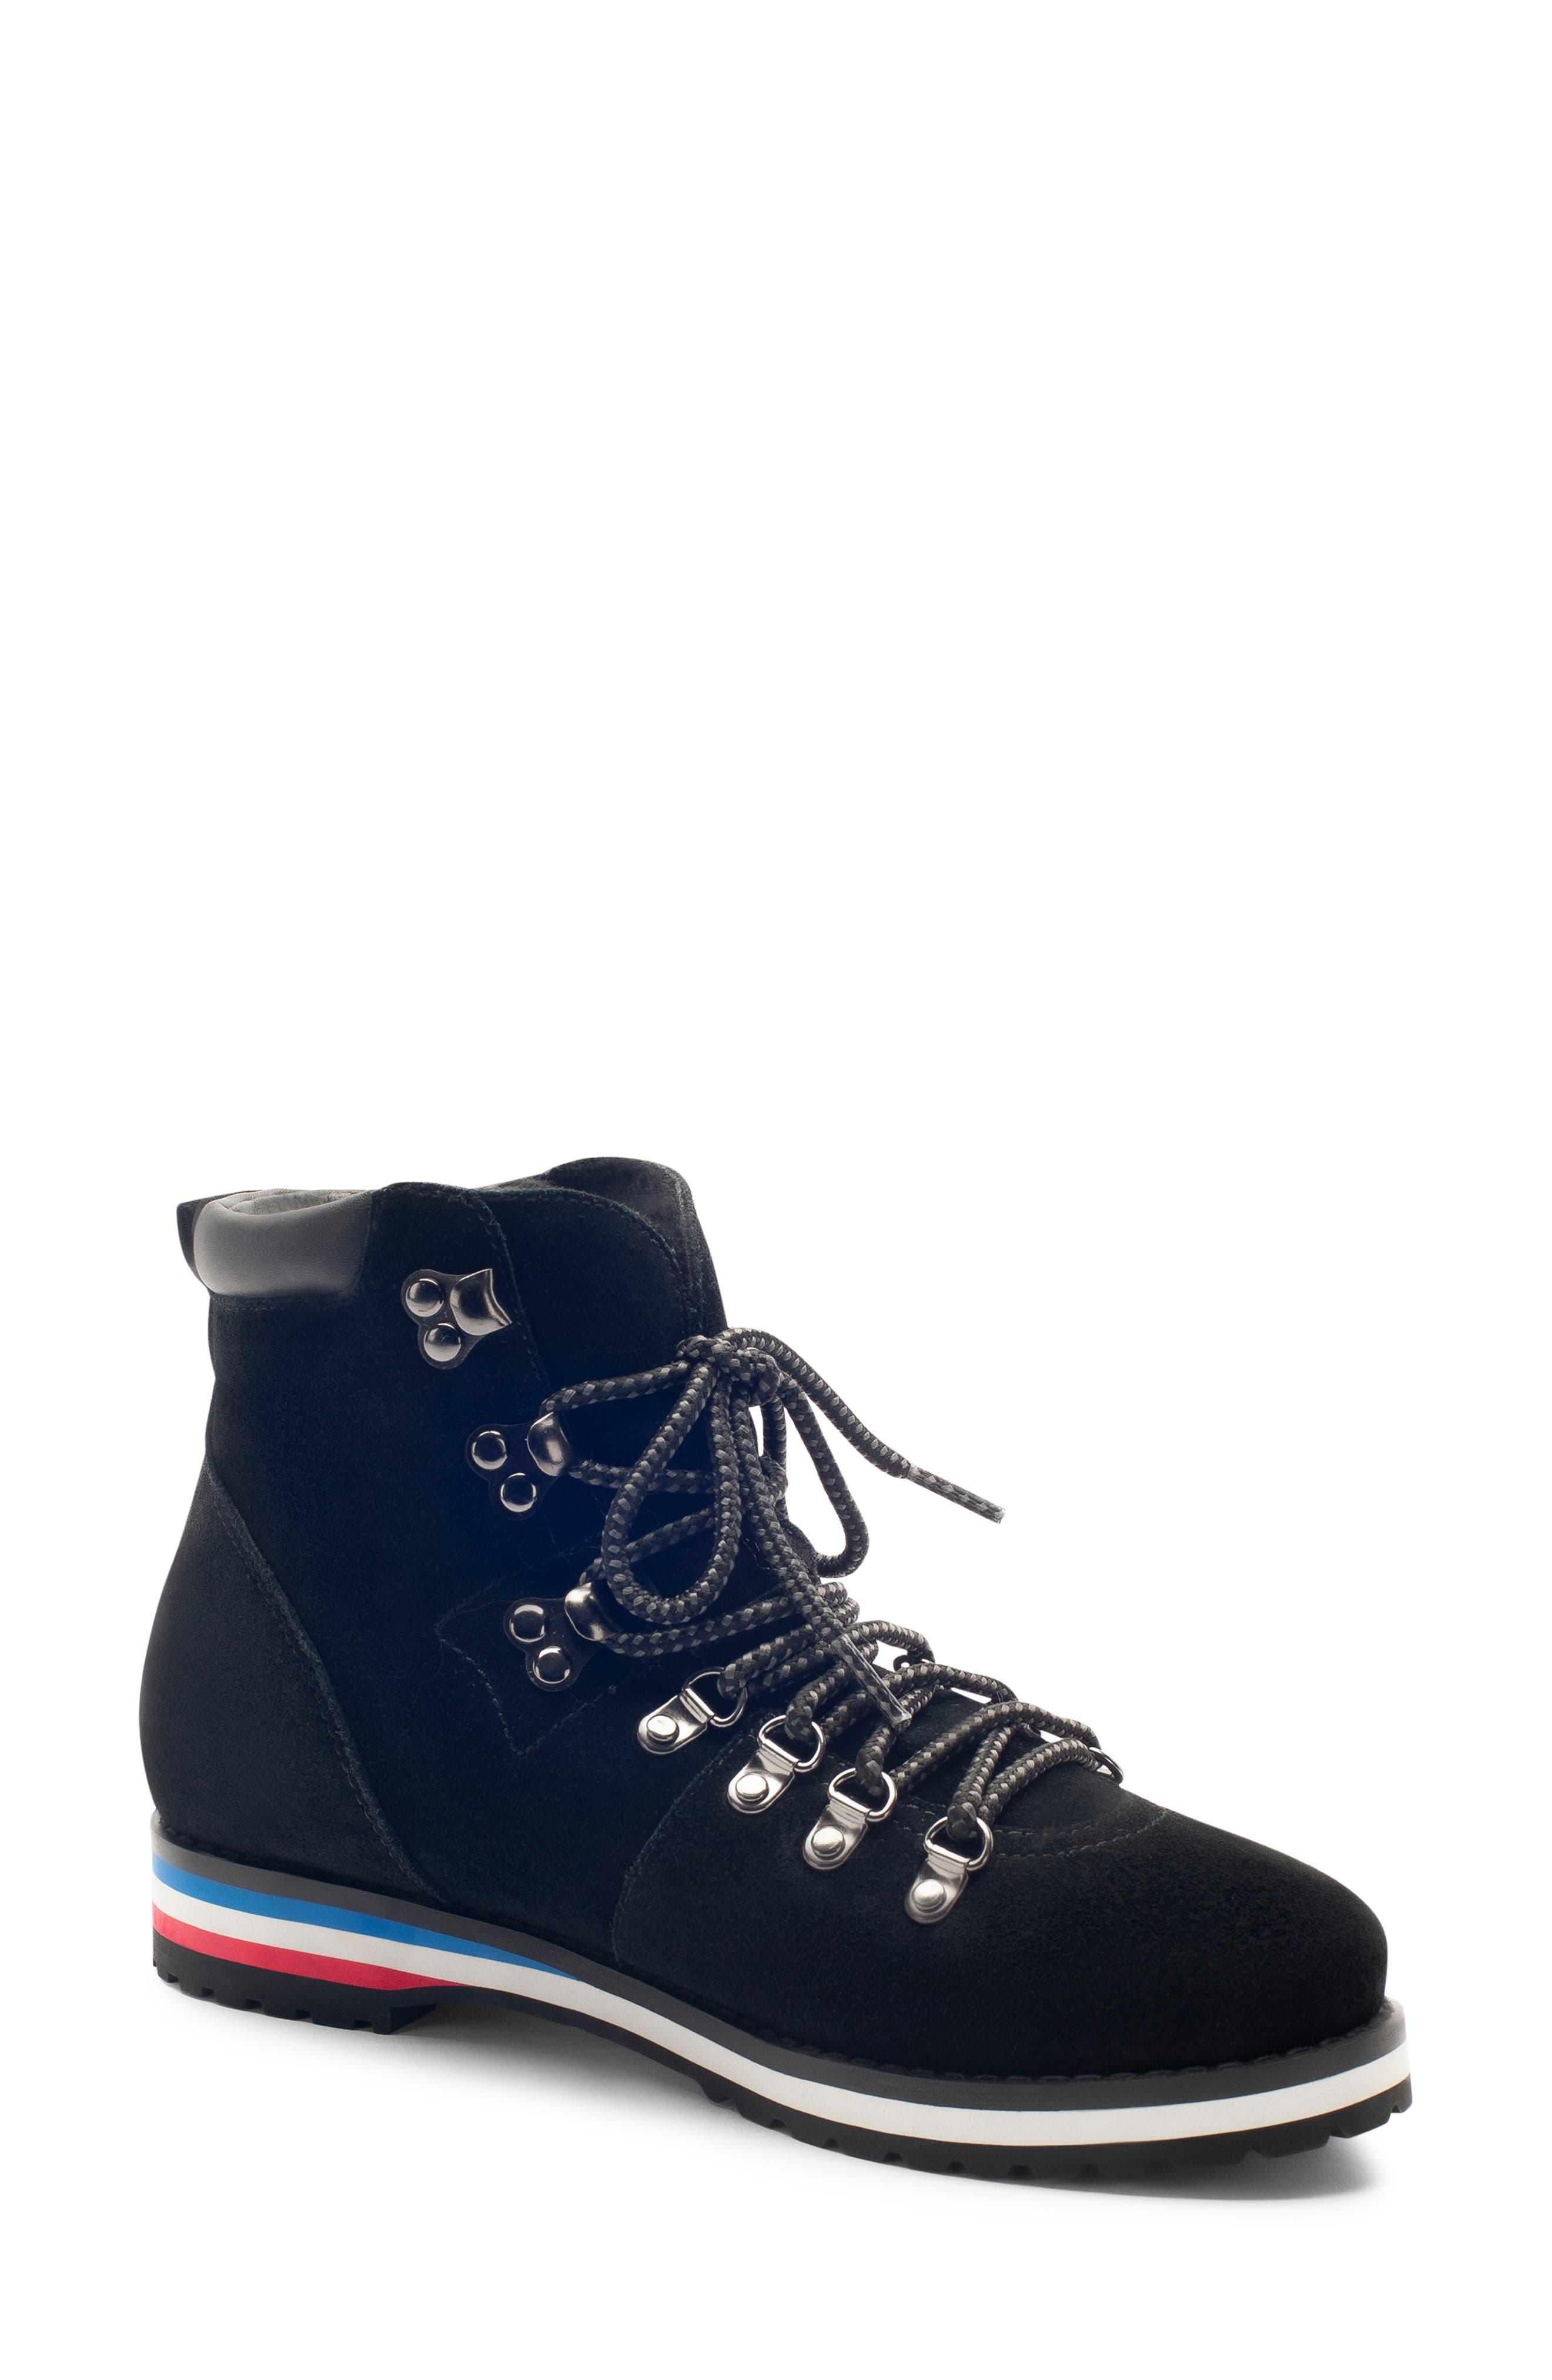 BLONDO Regan Waterproof Boot, Main, color, BLACK SUEDE